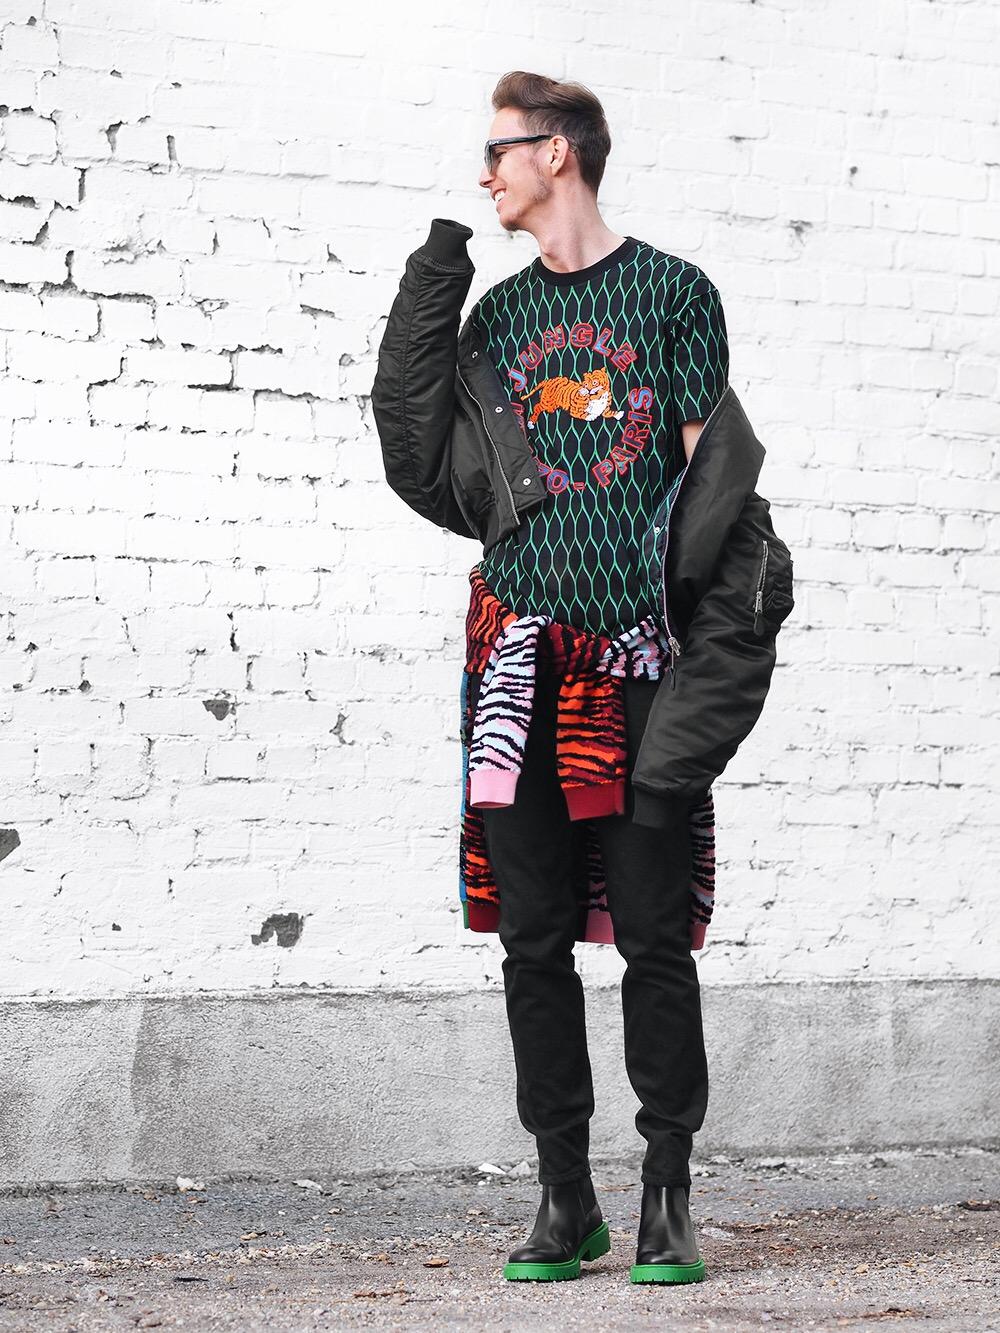 kenzoxhm-outfit-vibrant-playful-pattern-kenzo-hm-outfit-smizedivat-fashionblogger-streetstyle-menswear-collection-_3.JPG